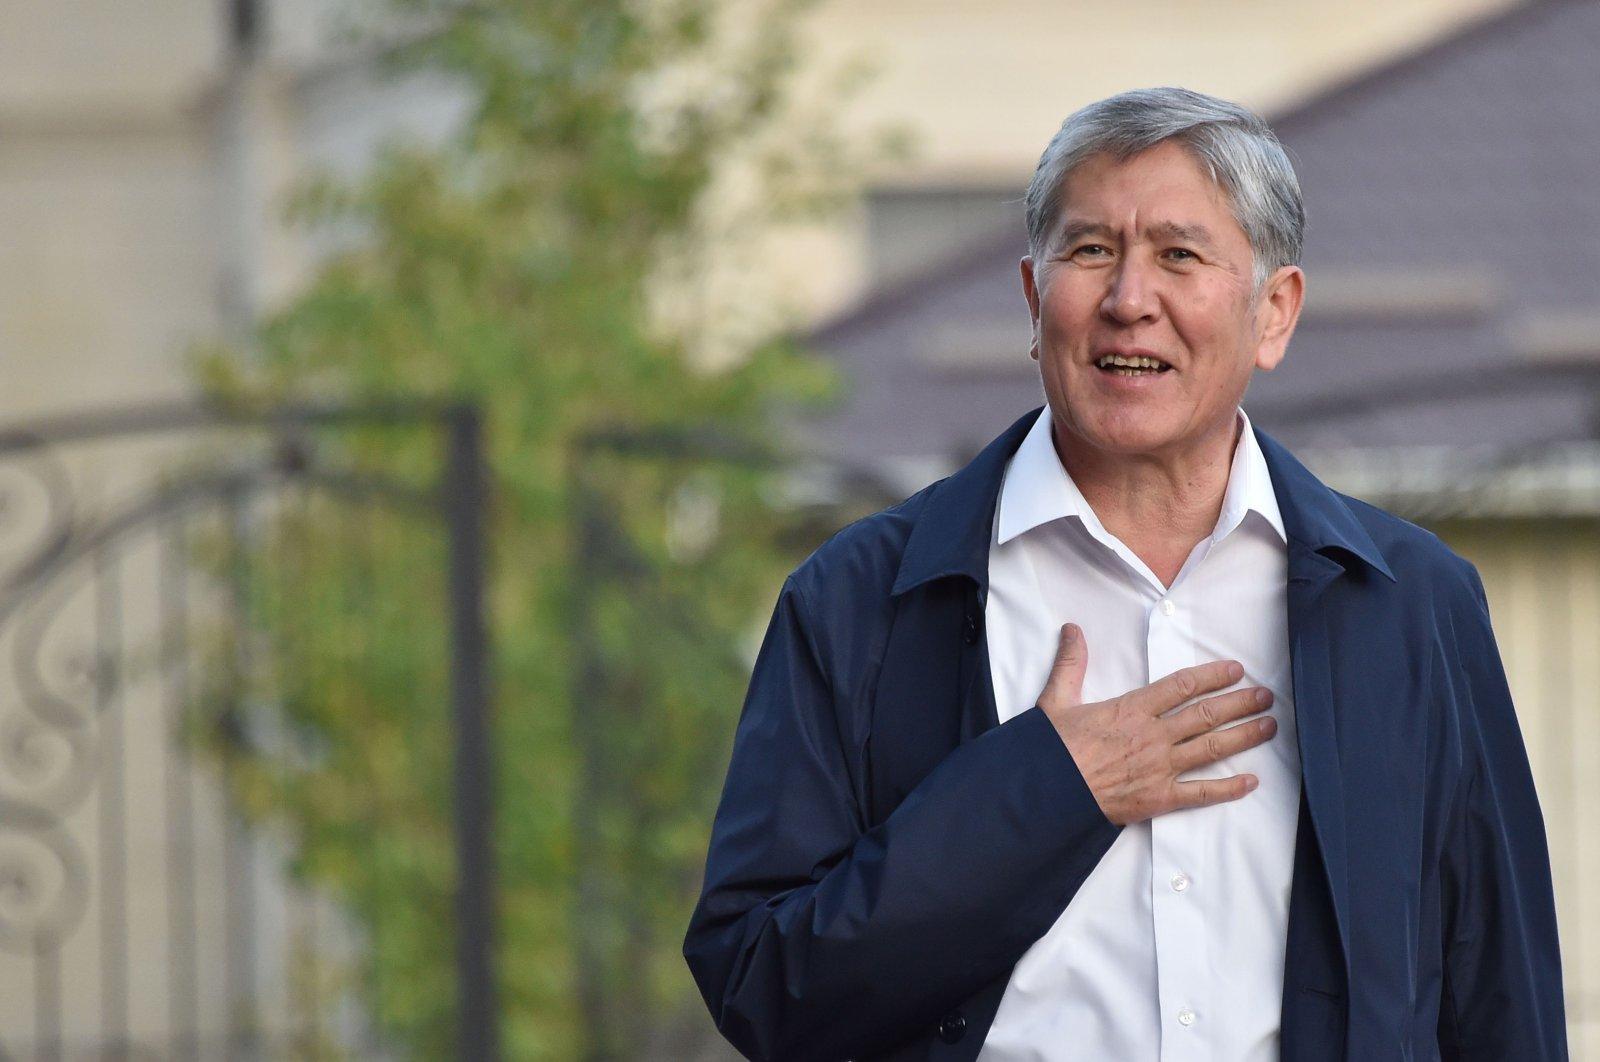 In this file photo taken on June 27, 2019 Former Kyrgyz president Almazbek Atambayev stands outside his residence in the village of Koi-Tash near the capital Bishkek. (AFP Photo)